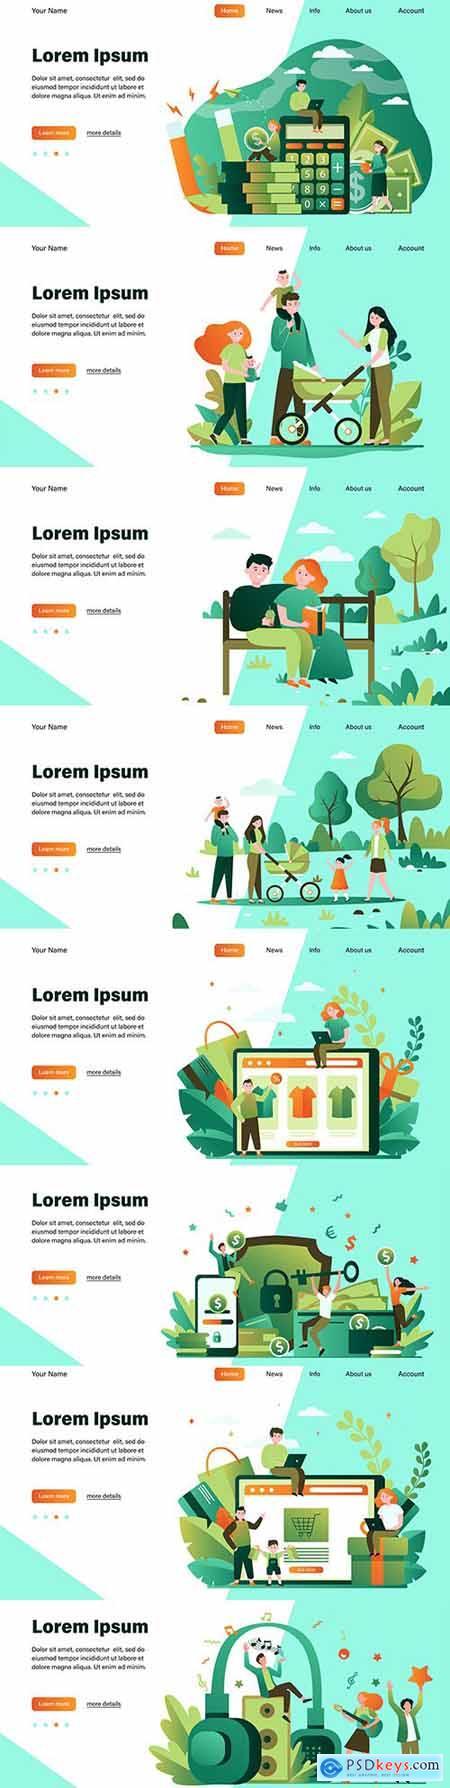 Happy People flat illustration design target web page